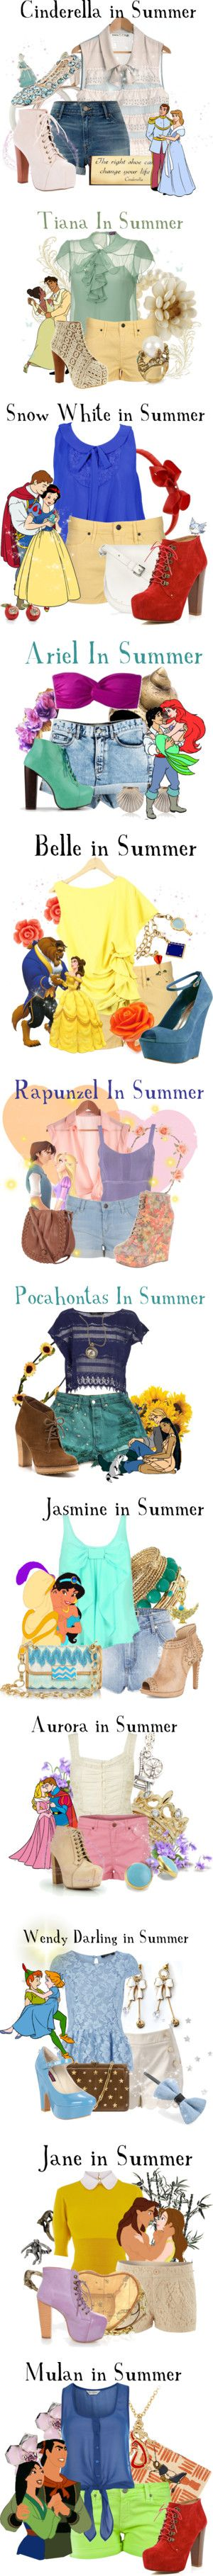 """Disney Summer Collection"" so cute!!!"